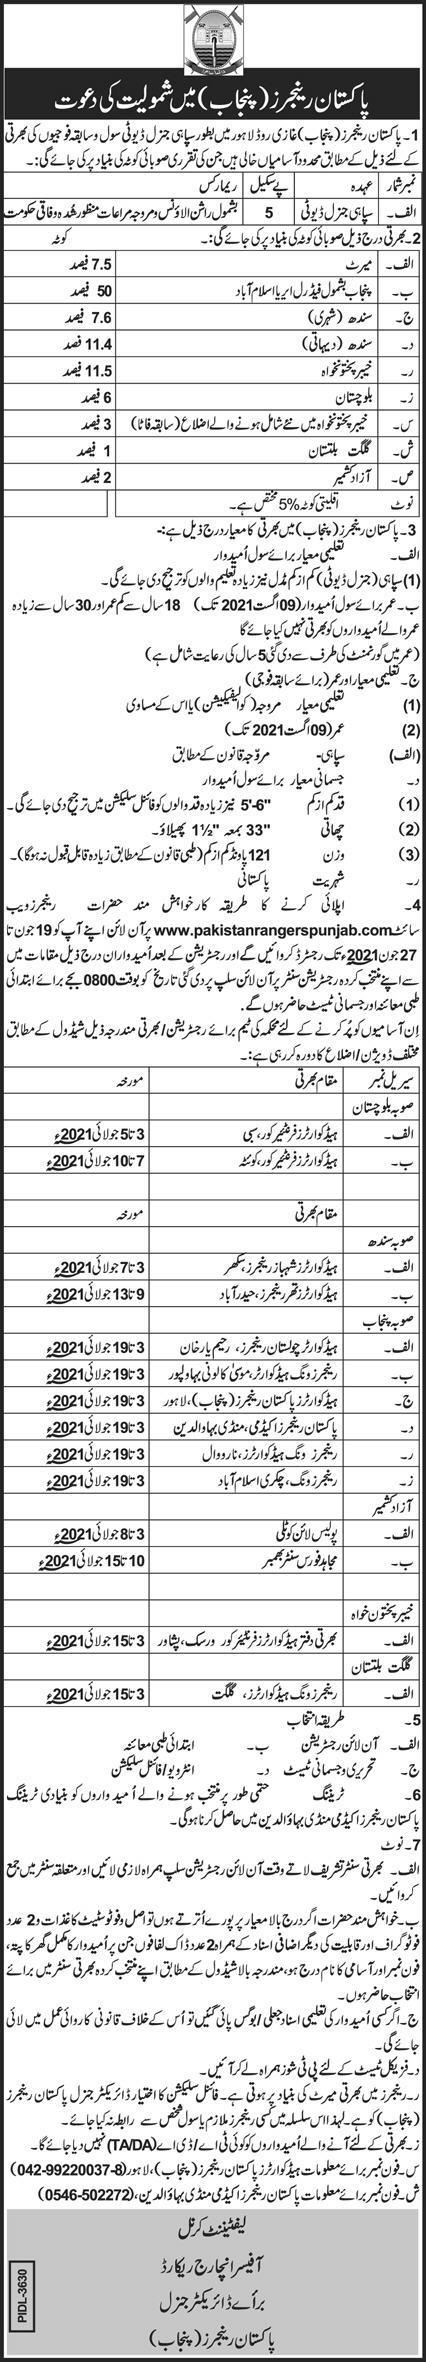 Pakistan Rangers Punjab Latest Jobs 2021